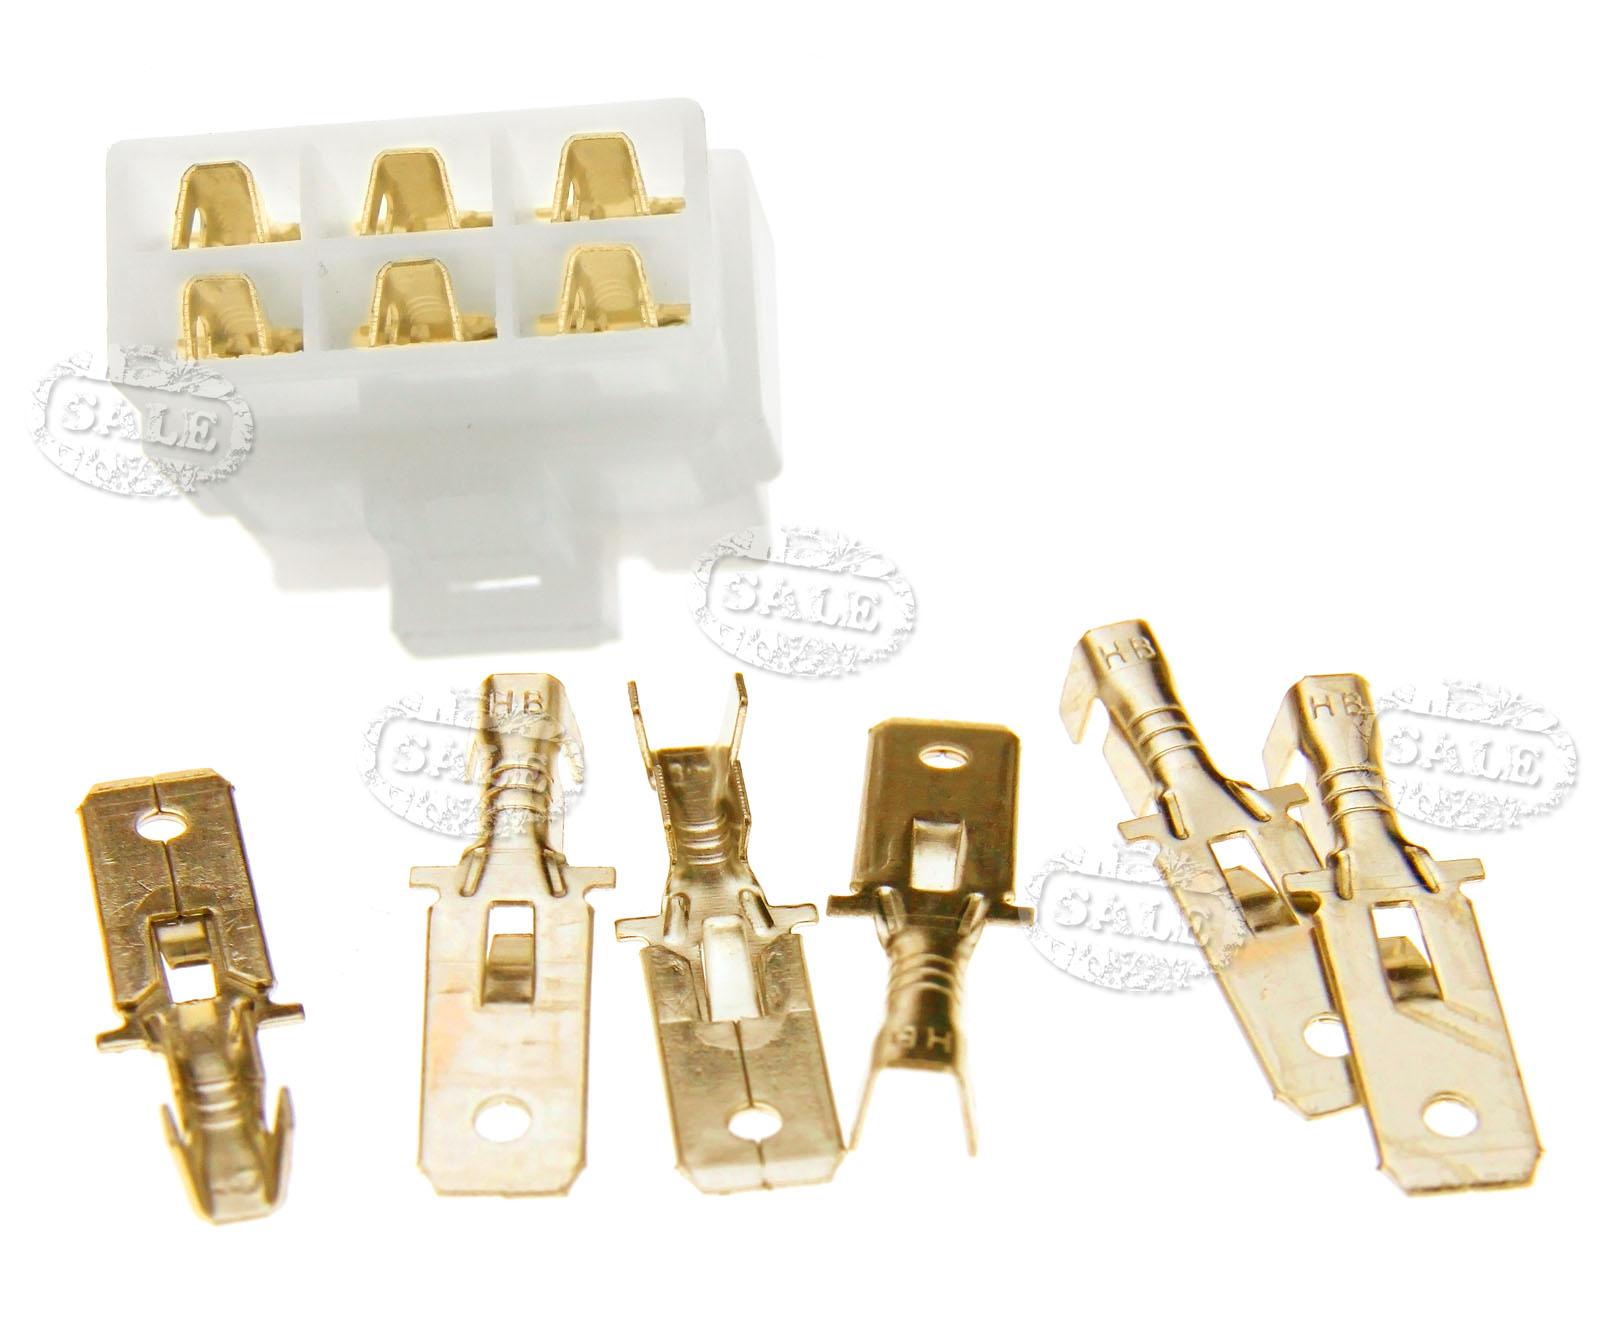 6 Pin Terminal Block Škoda 1j0973713: 10 Sets 6.3MM 6 WAY PIN ELECTRICAL MULTI PLUG CONNECTOR